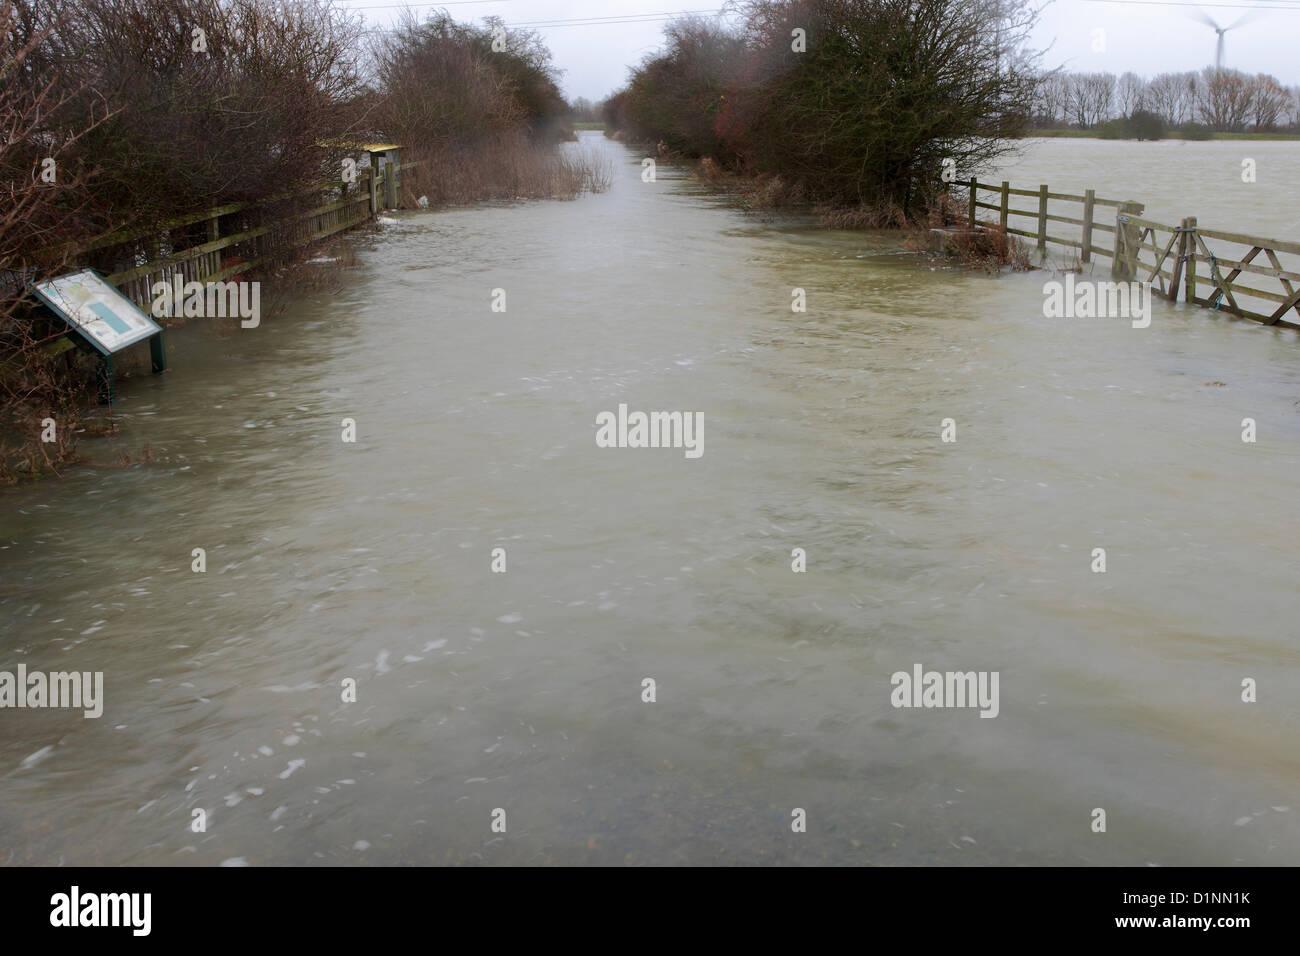 Peterborough, UK. 1st Jan, 2013.View of the Flooded river Nene, Whittlesey Washes, Peterborough, Cambridgeshire, - Stock Image